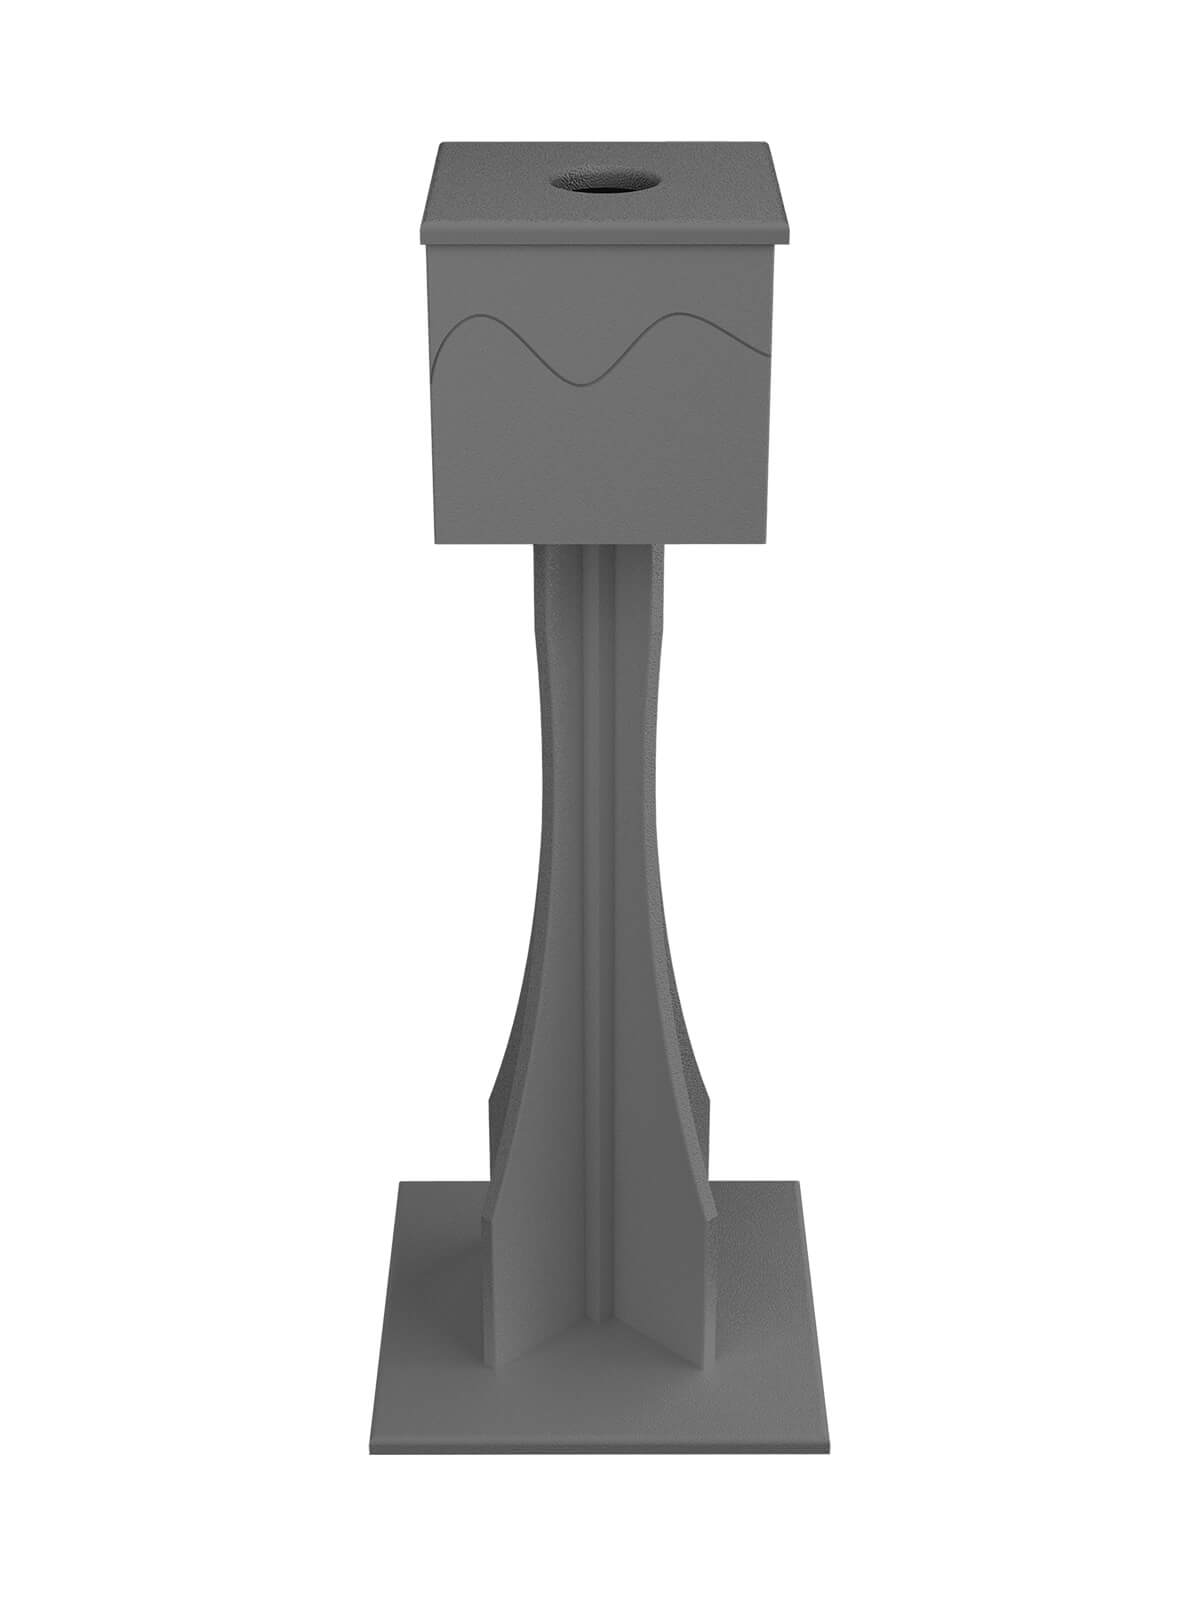 REVIVE - Unit - Circle - Grey